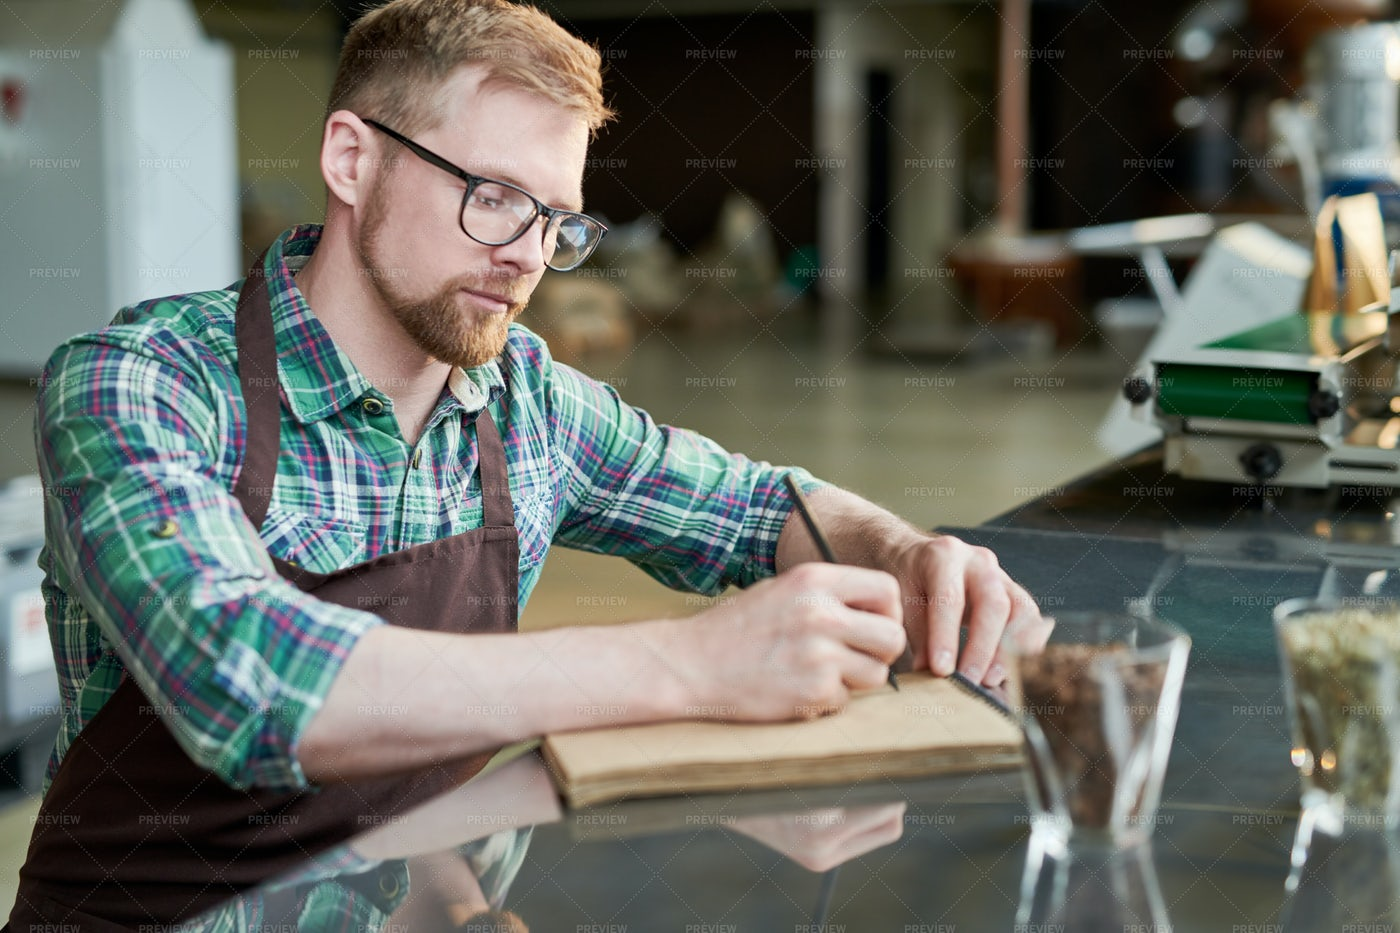 Barista Writing Blends Of Coffee: Stock Photos